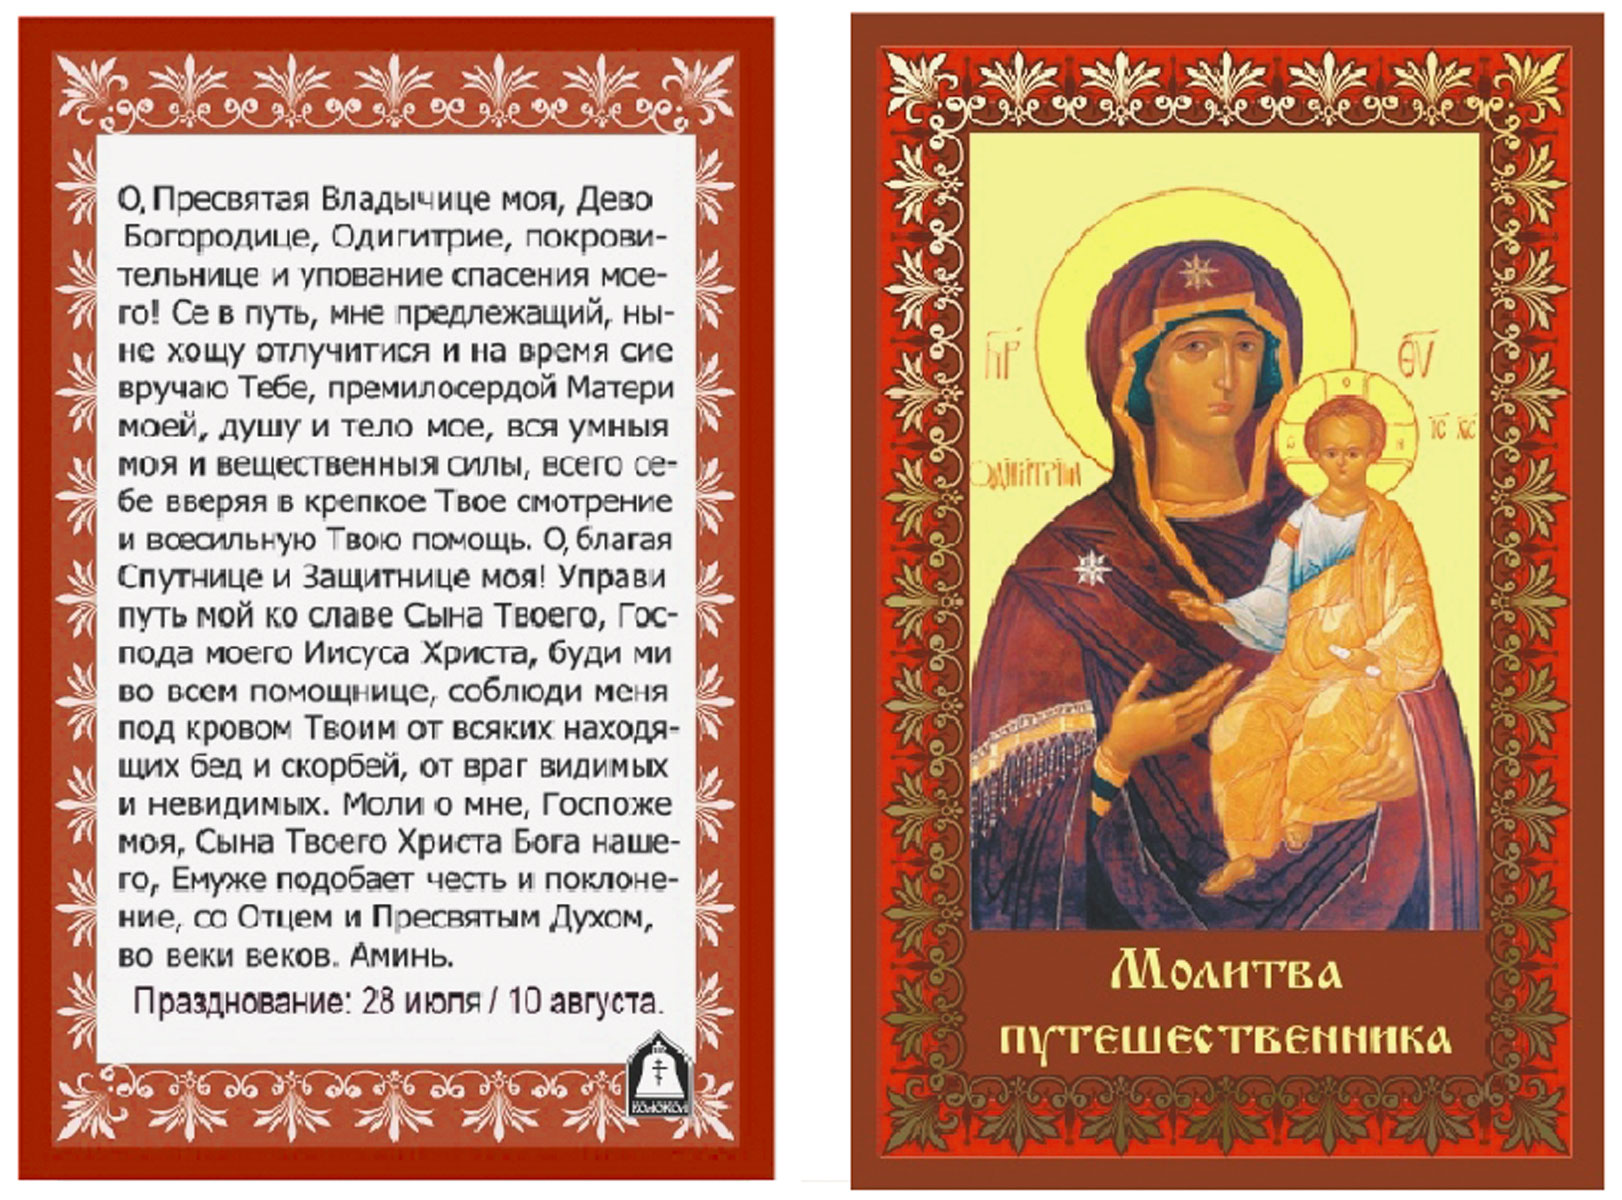 Икона богородицы скоропослушница молитва о